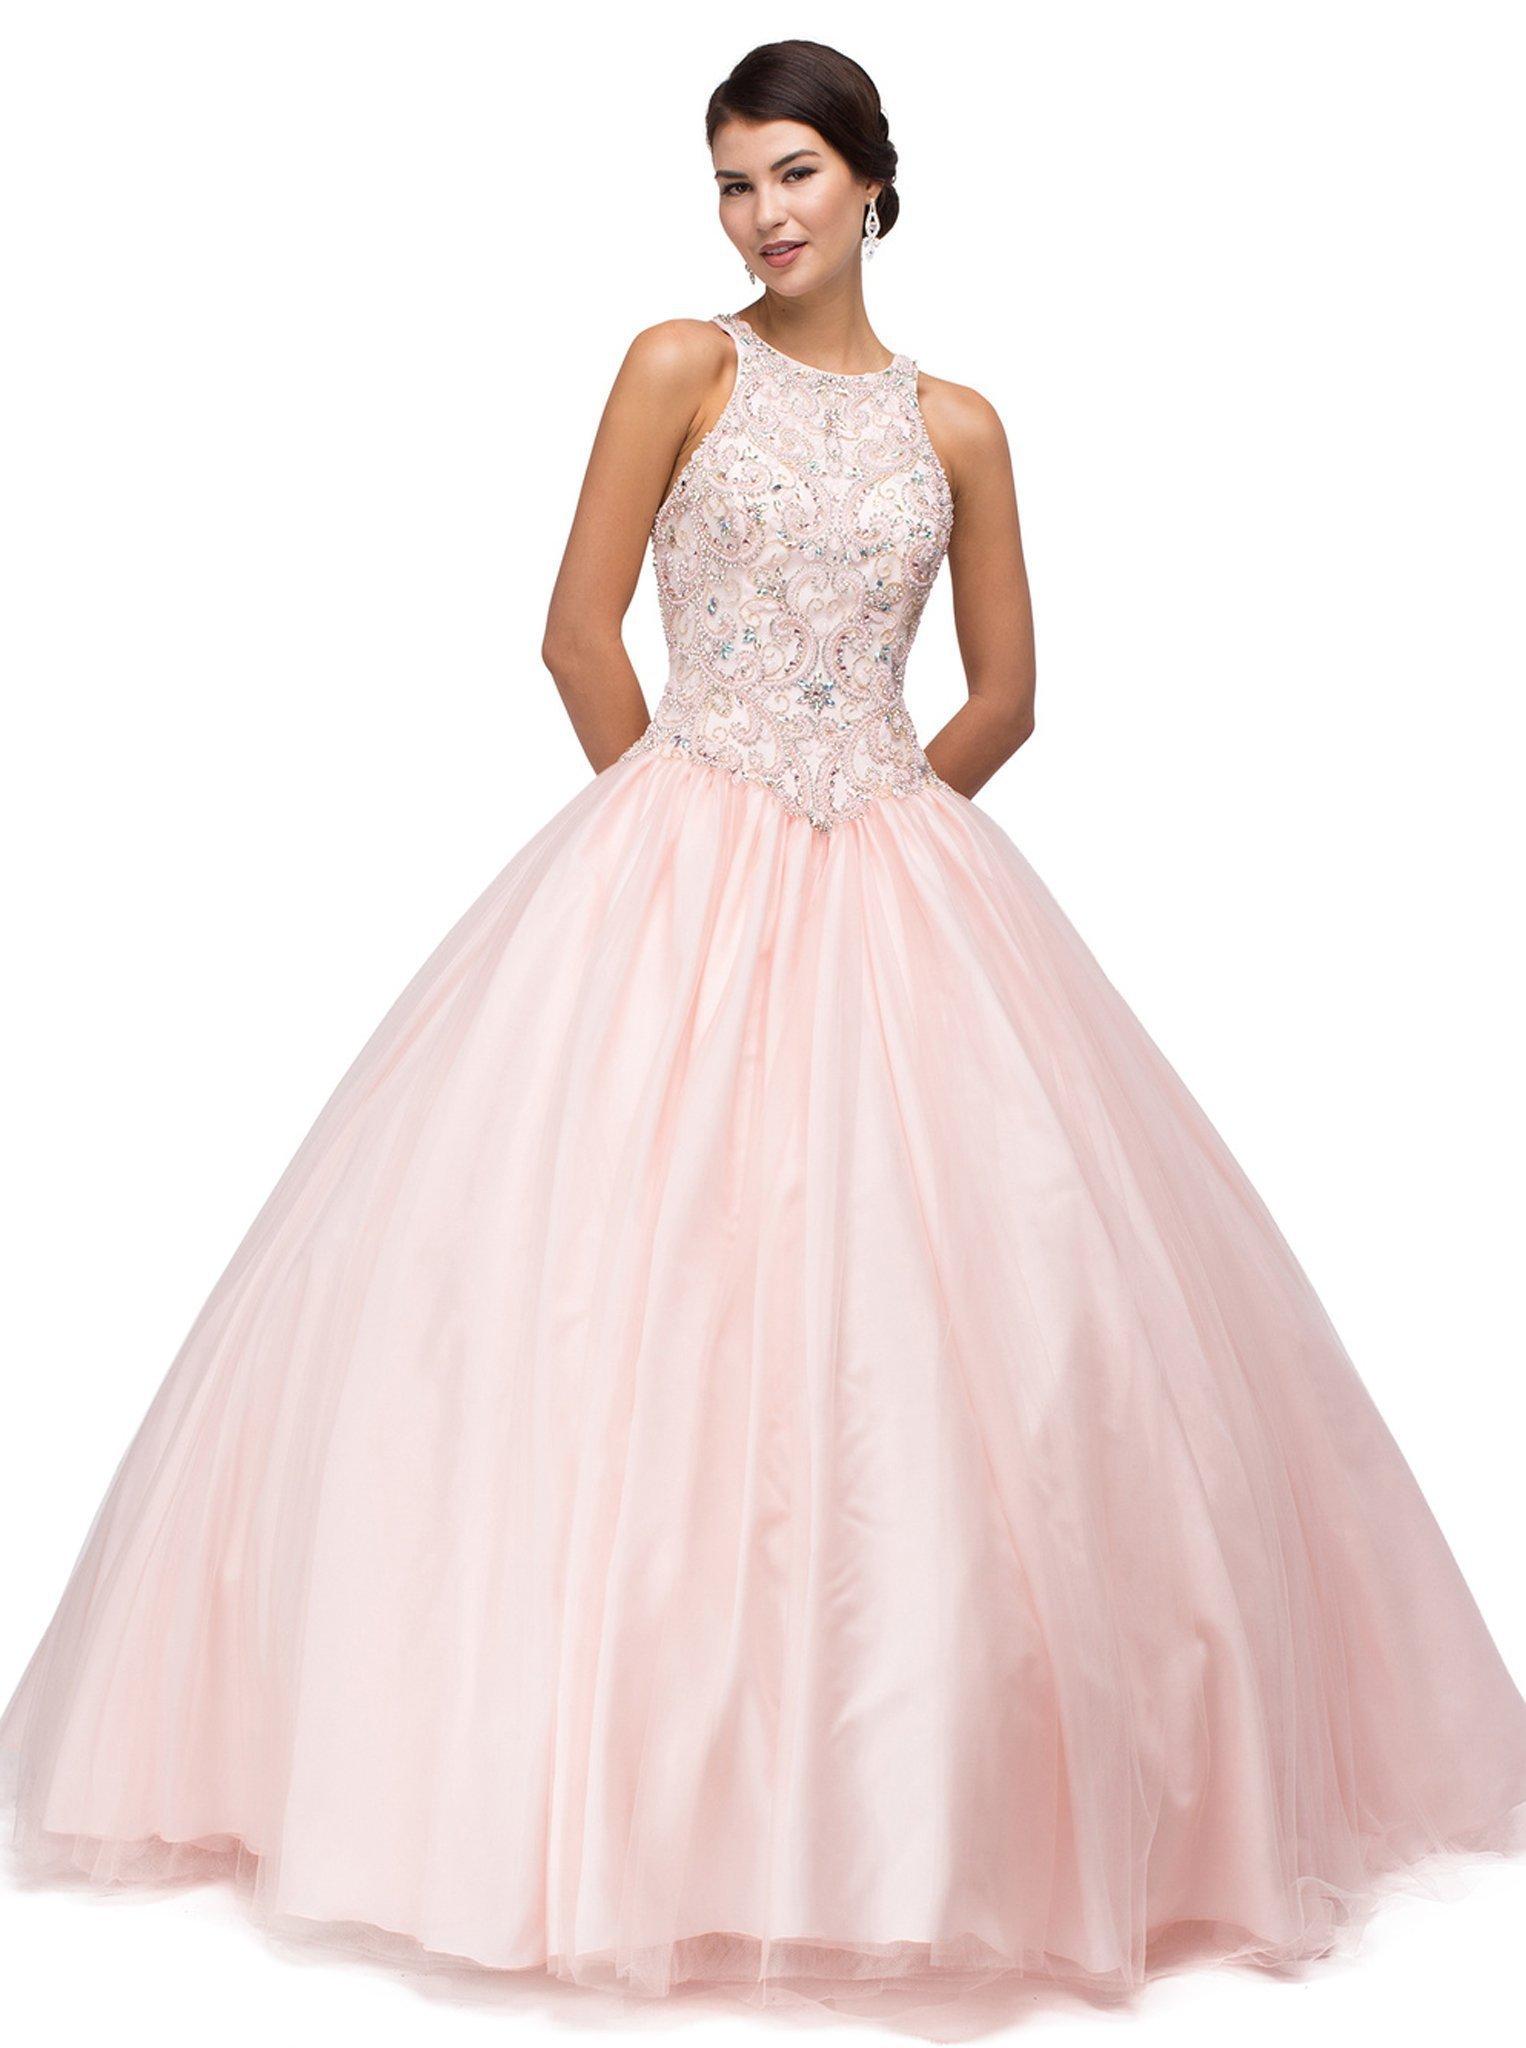 Dancing Queen - 1164 Sleeveless Jewel Embellished Quinceanera Ball Gown